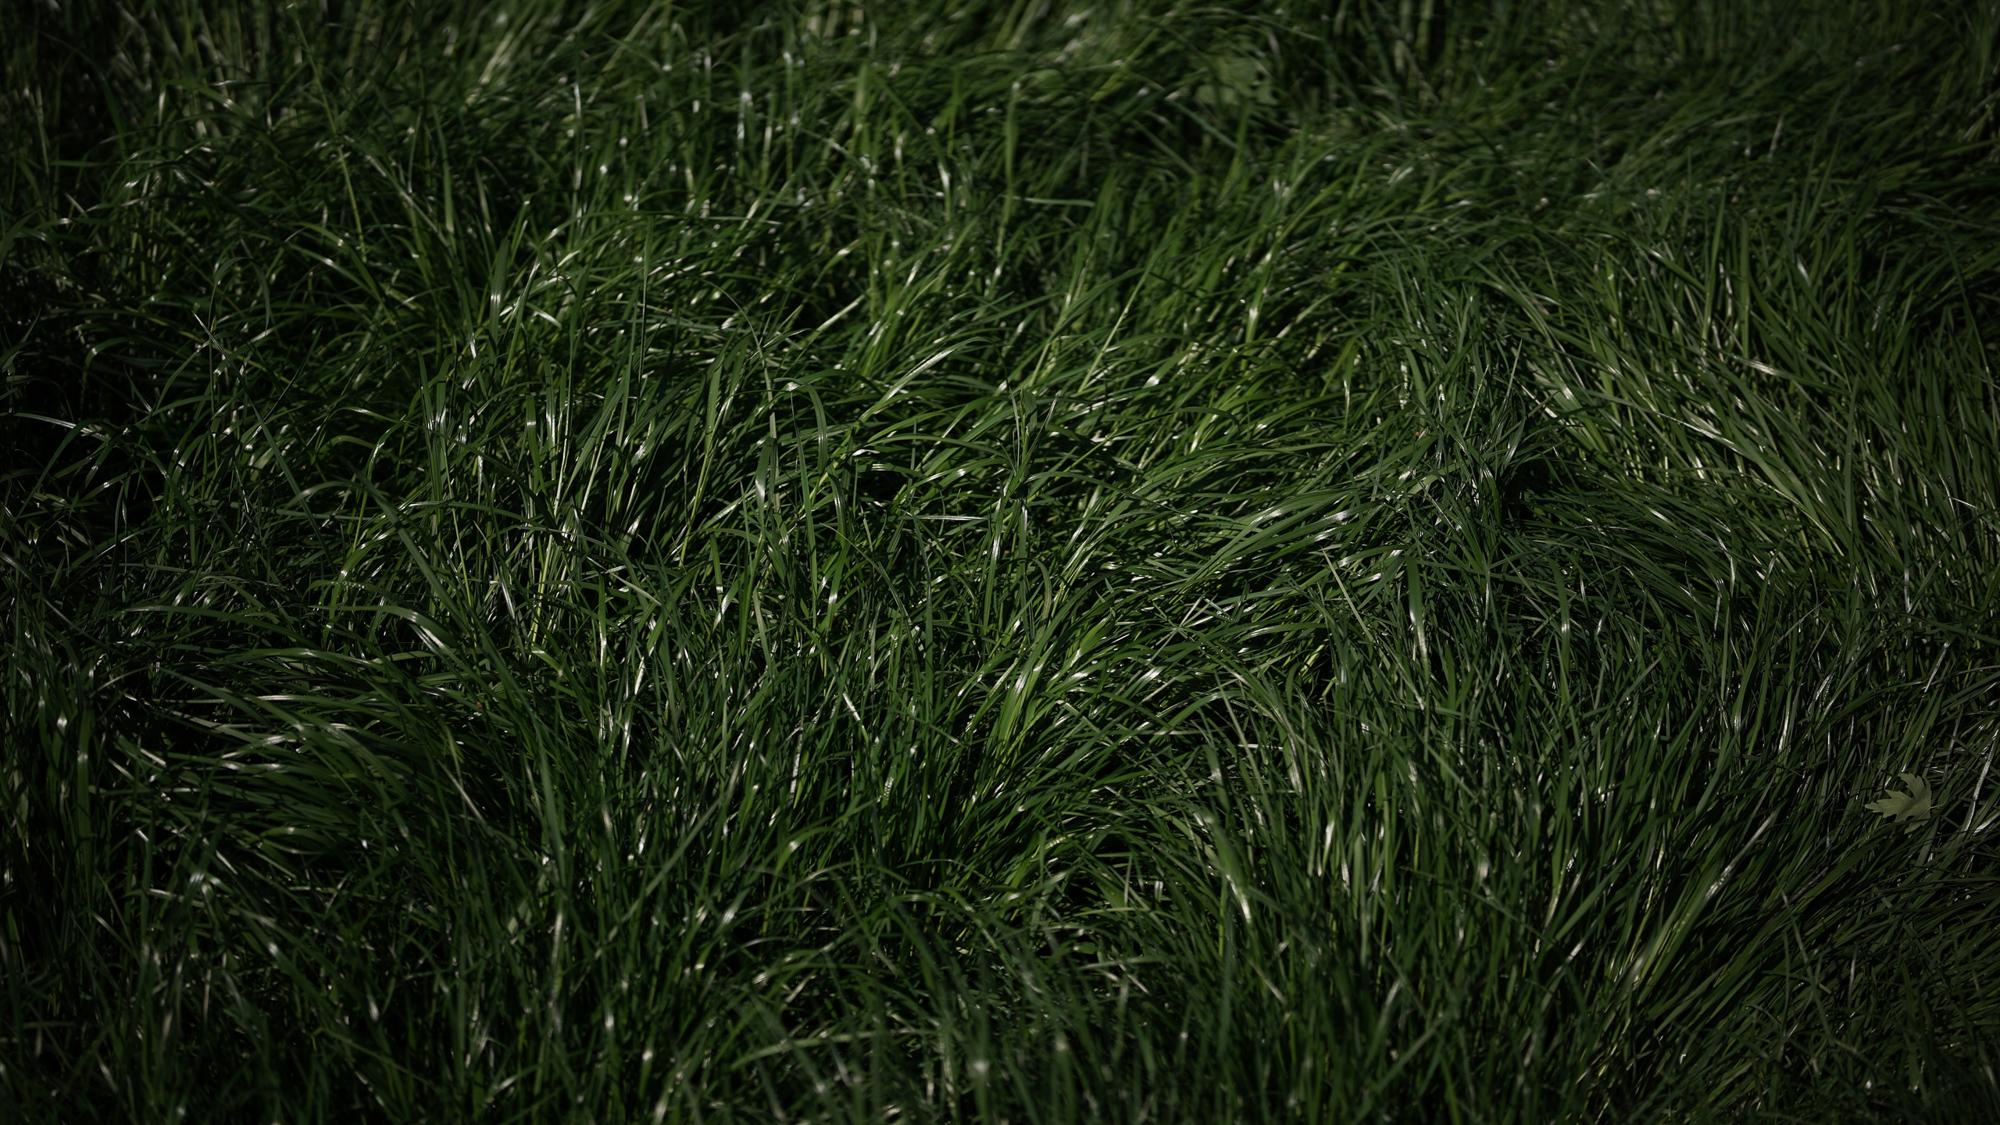 Sample Photos - Voigtlander APO Lanthar 50 mm f/2.0 lens for Leica M